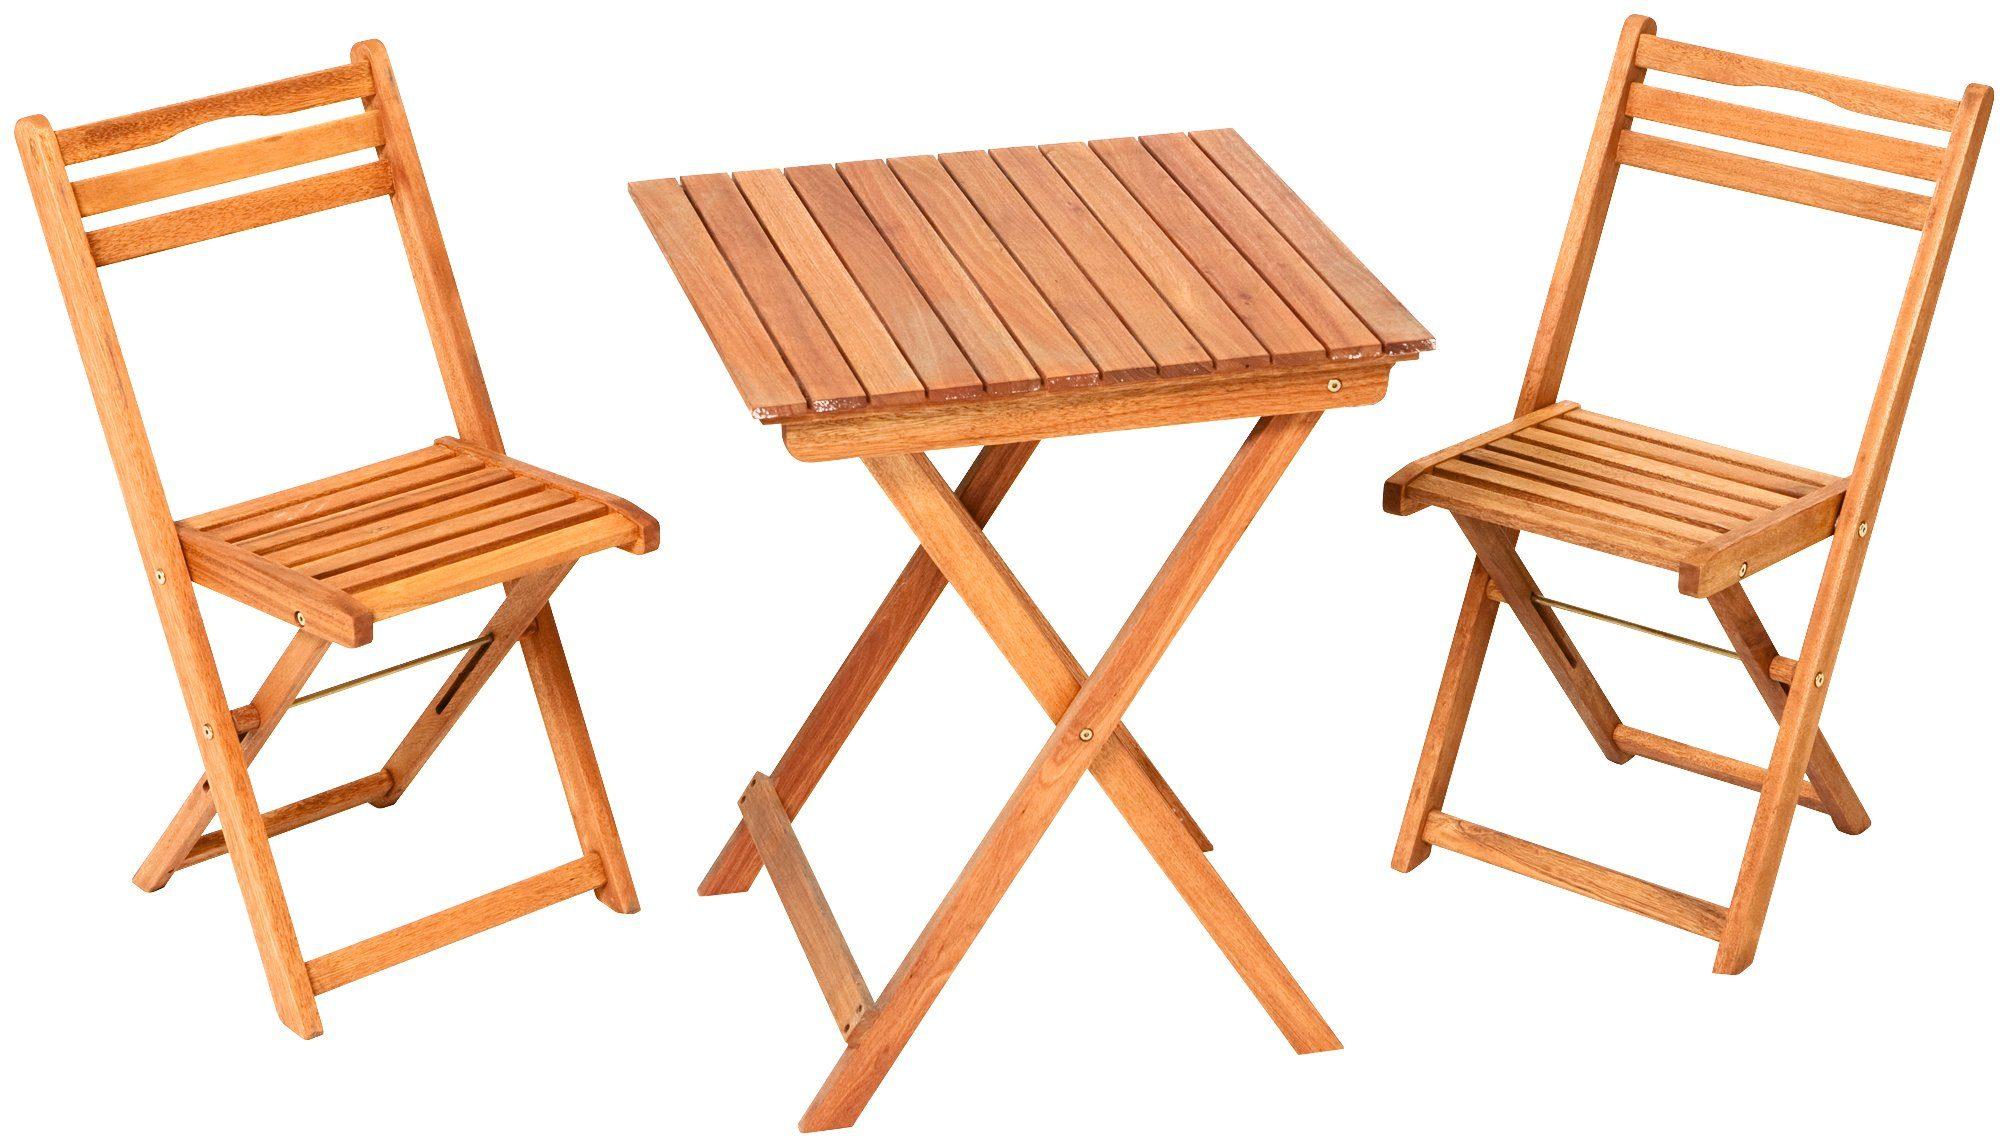 MERXX Gartenmöbelset »Porto«, 3tlg., 2 Sessel, Tisch, klappbar, Eukalyptusholz